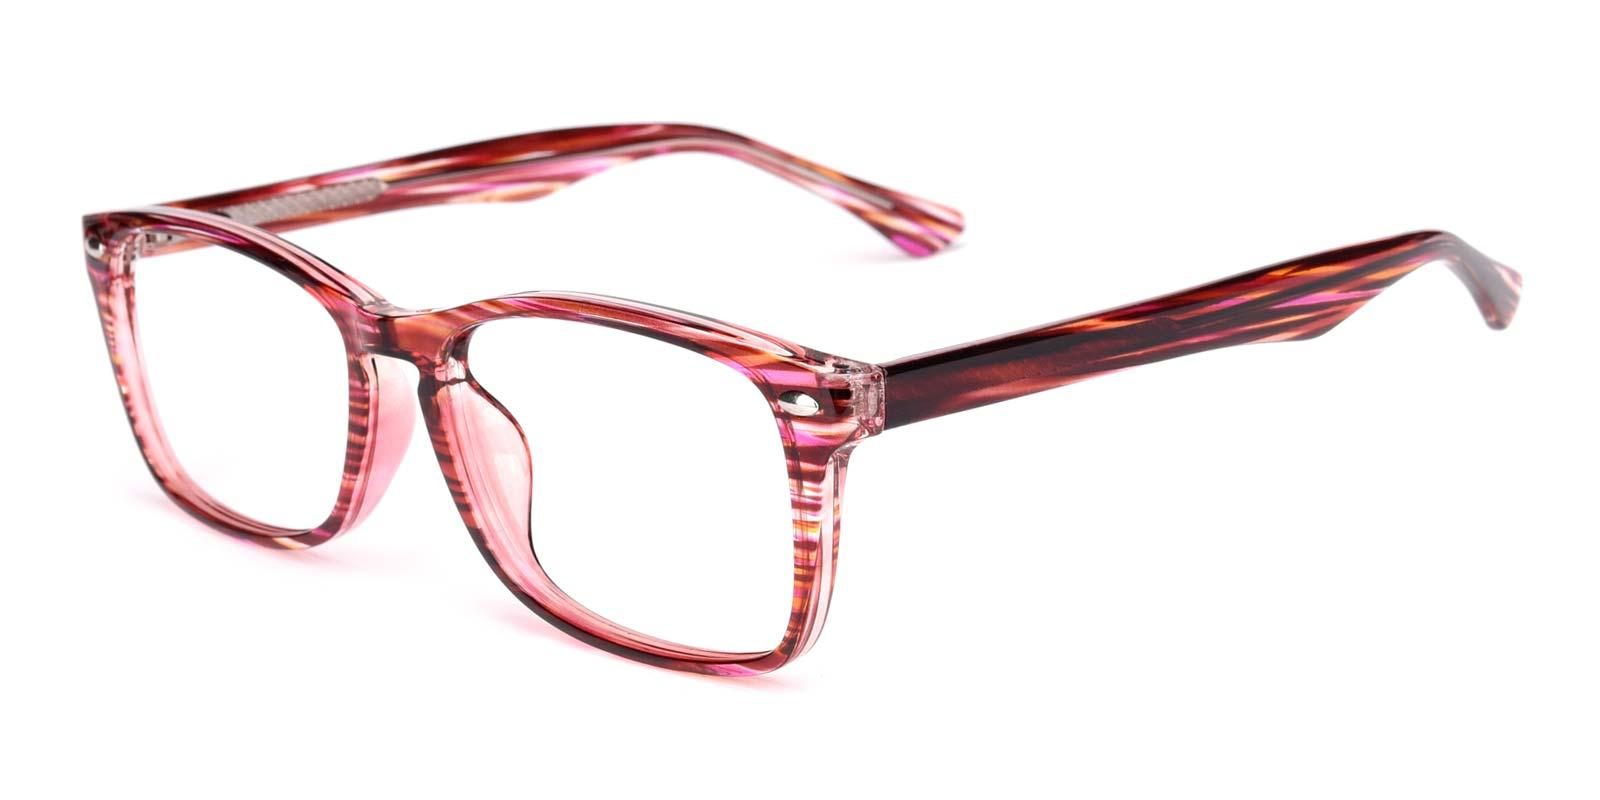 Rio-Red-Rectangle-TR-Eyeglasses-detail